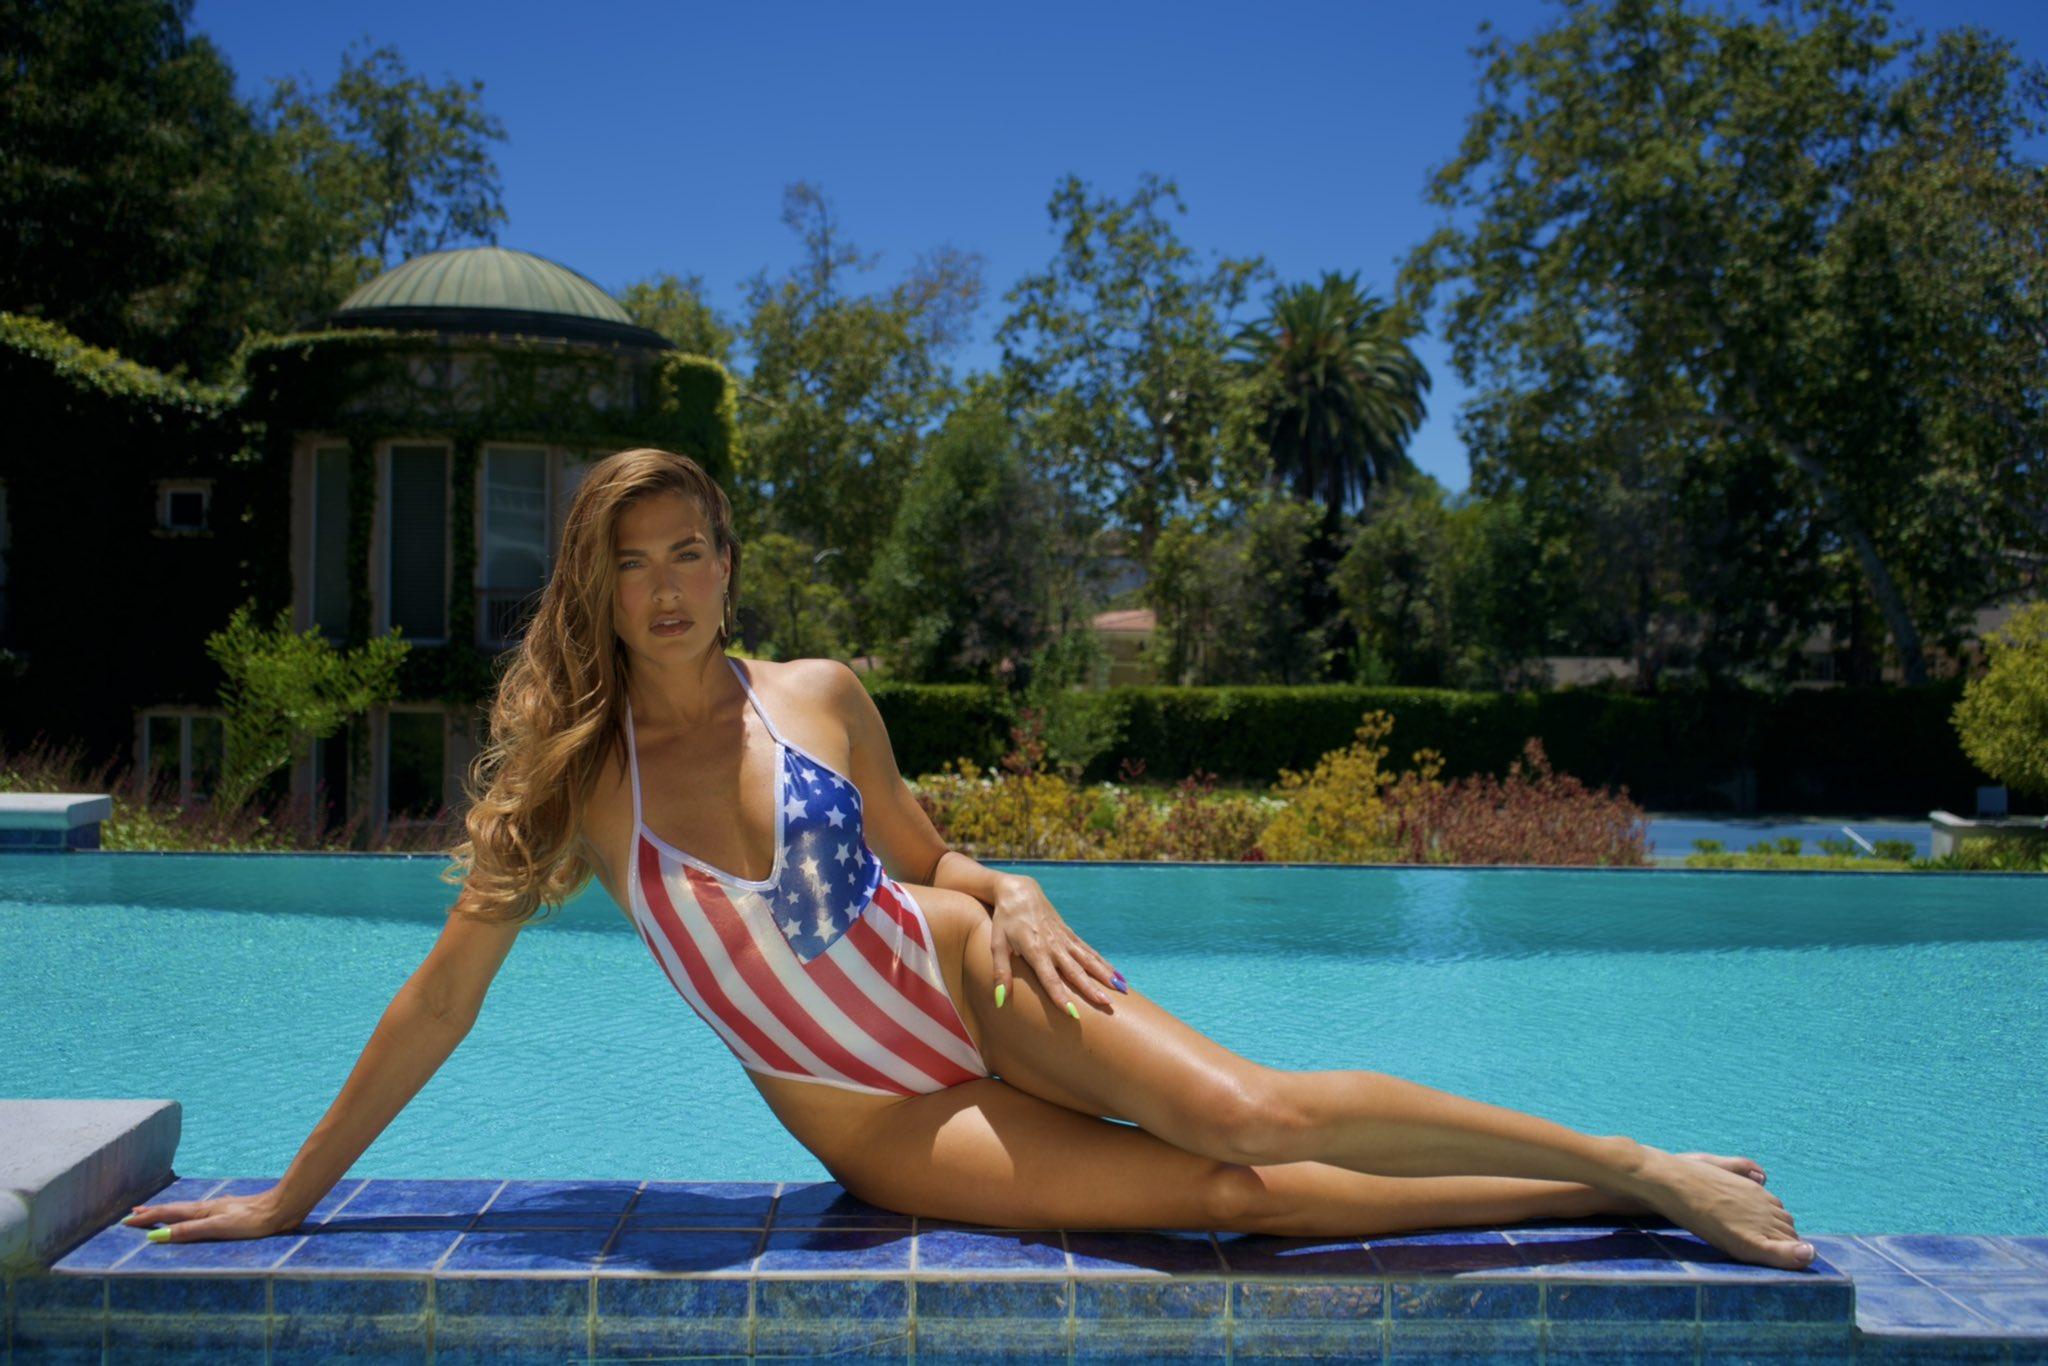 WWE Superstars Wishes Happy 4th Of July With Bikini Photos 2